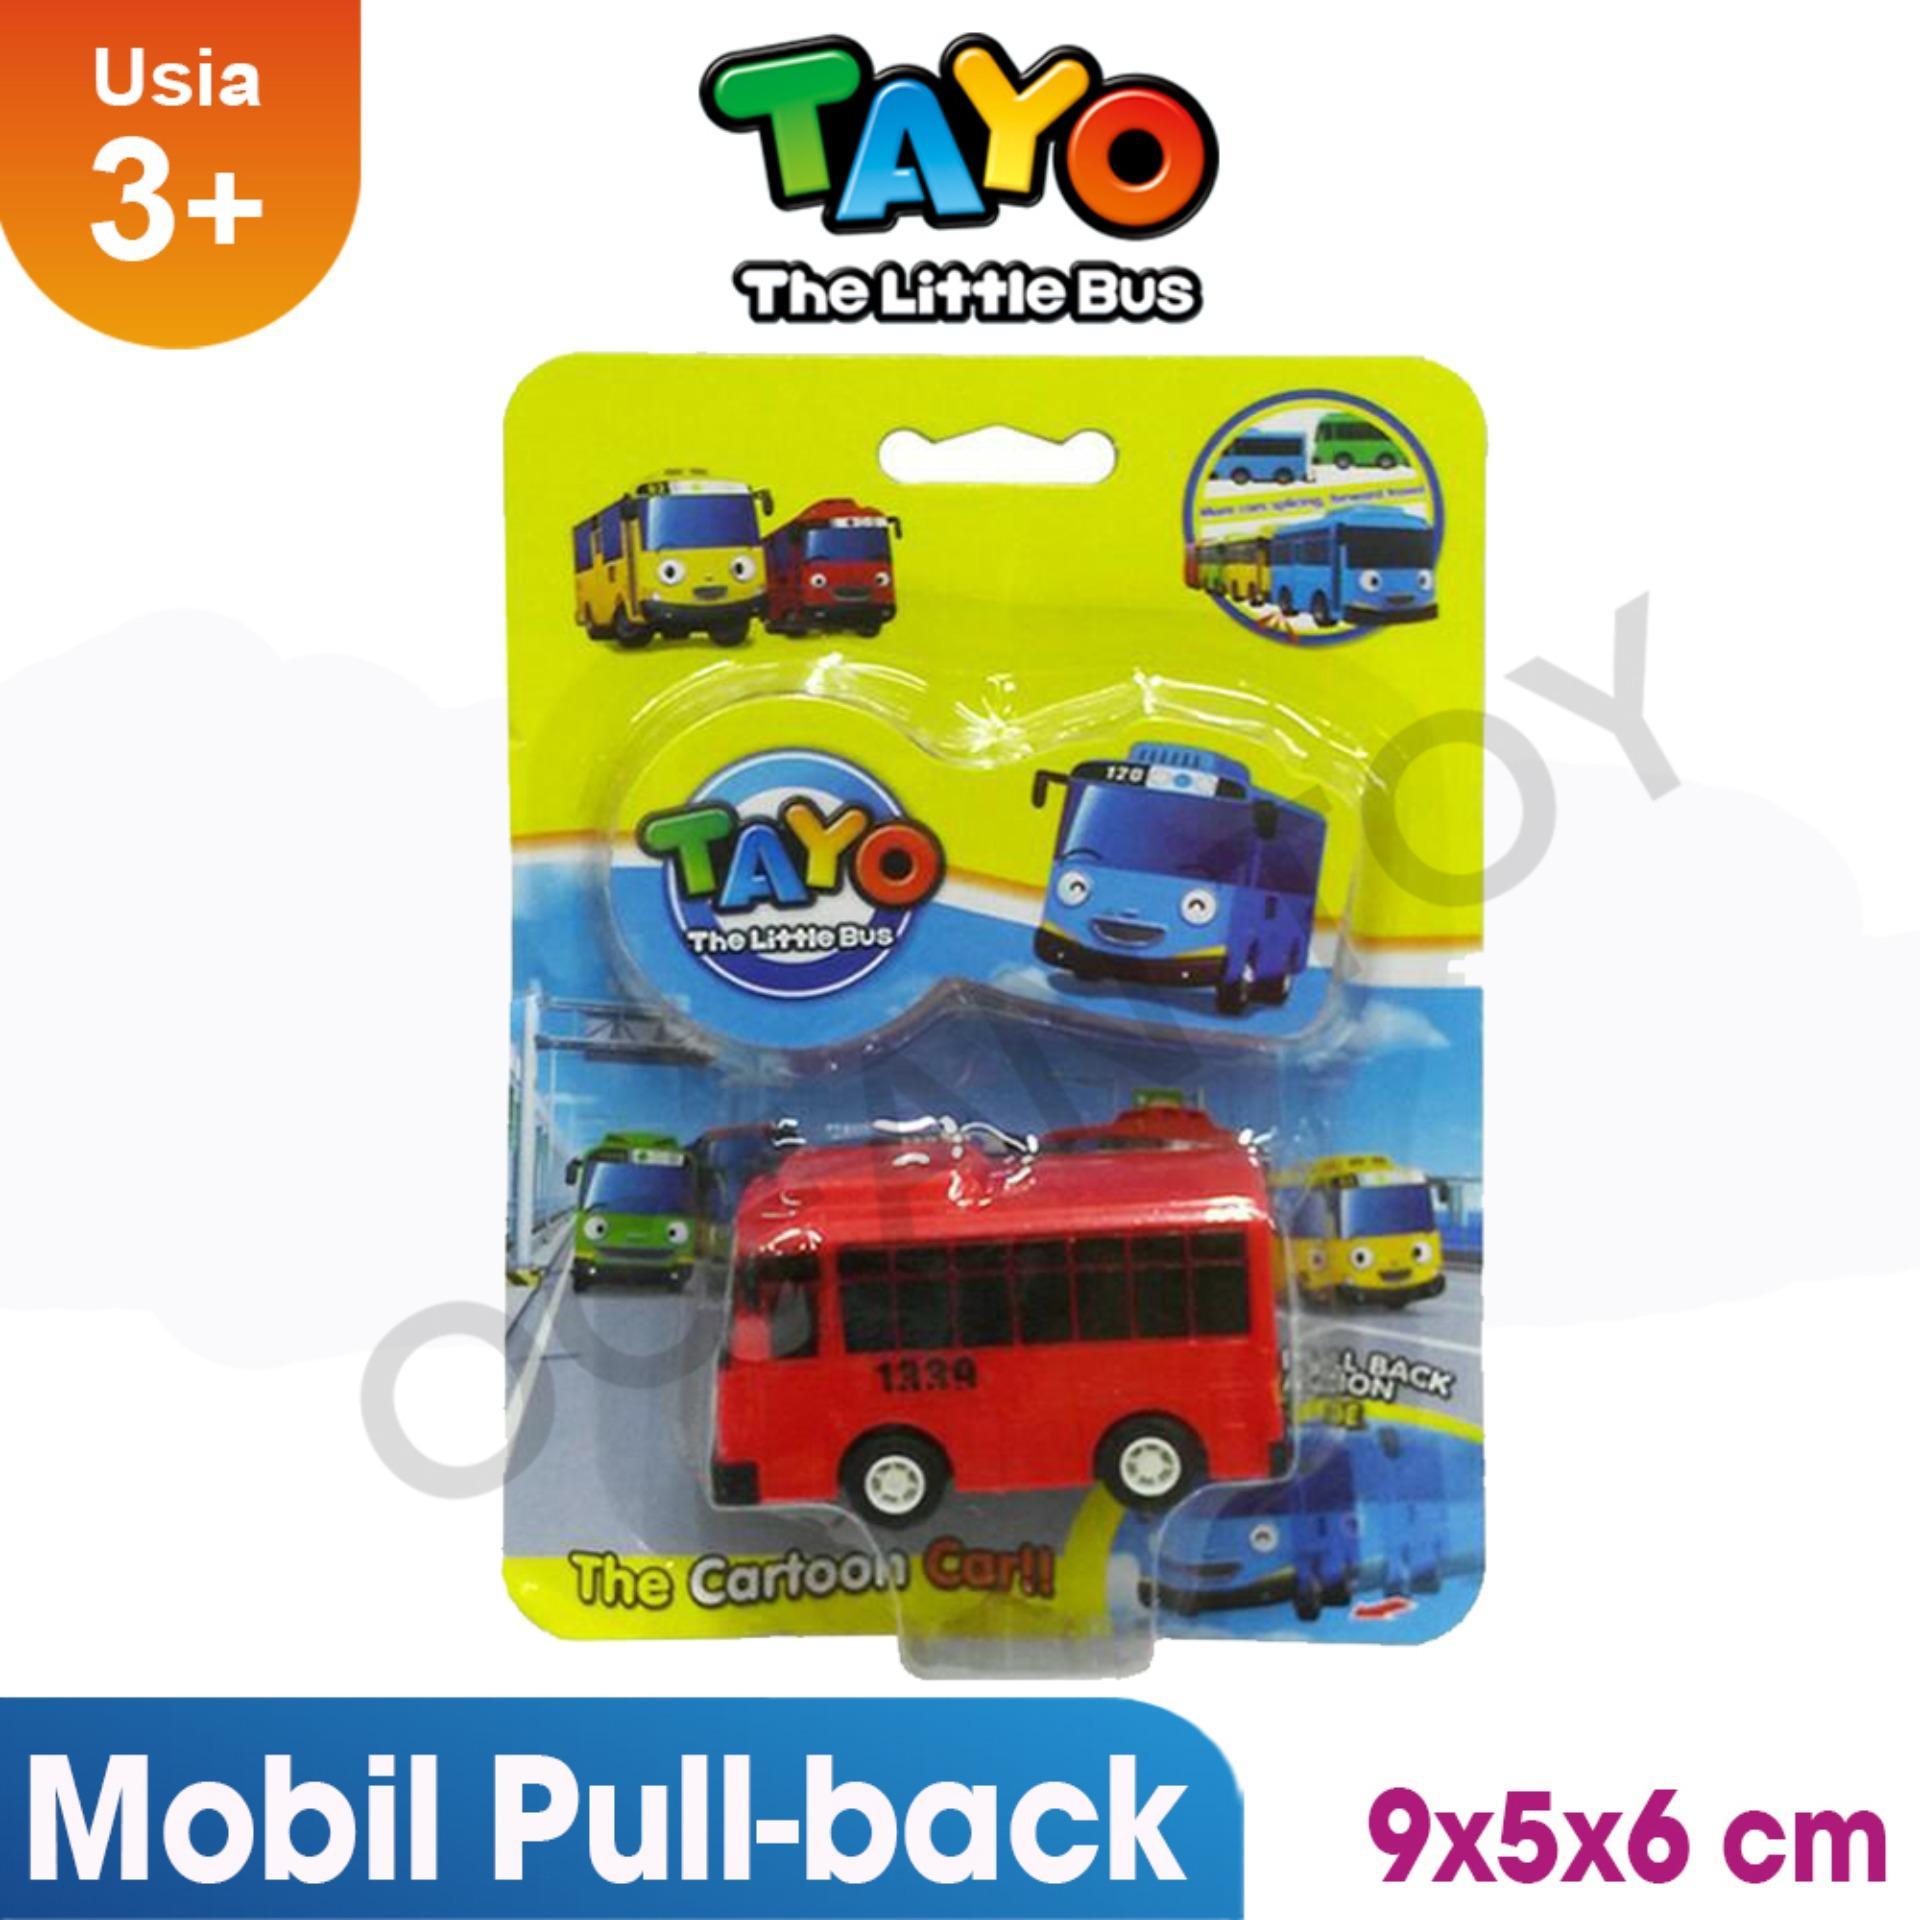 Mainan Murah Mobil Tayo Lazada Birthday Promo